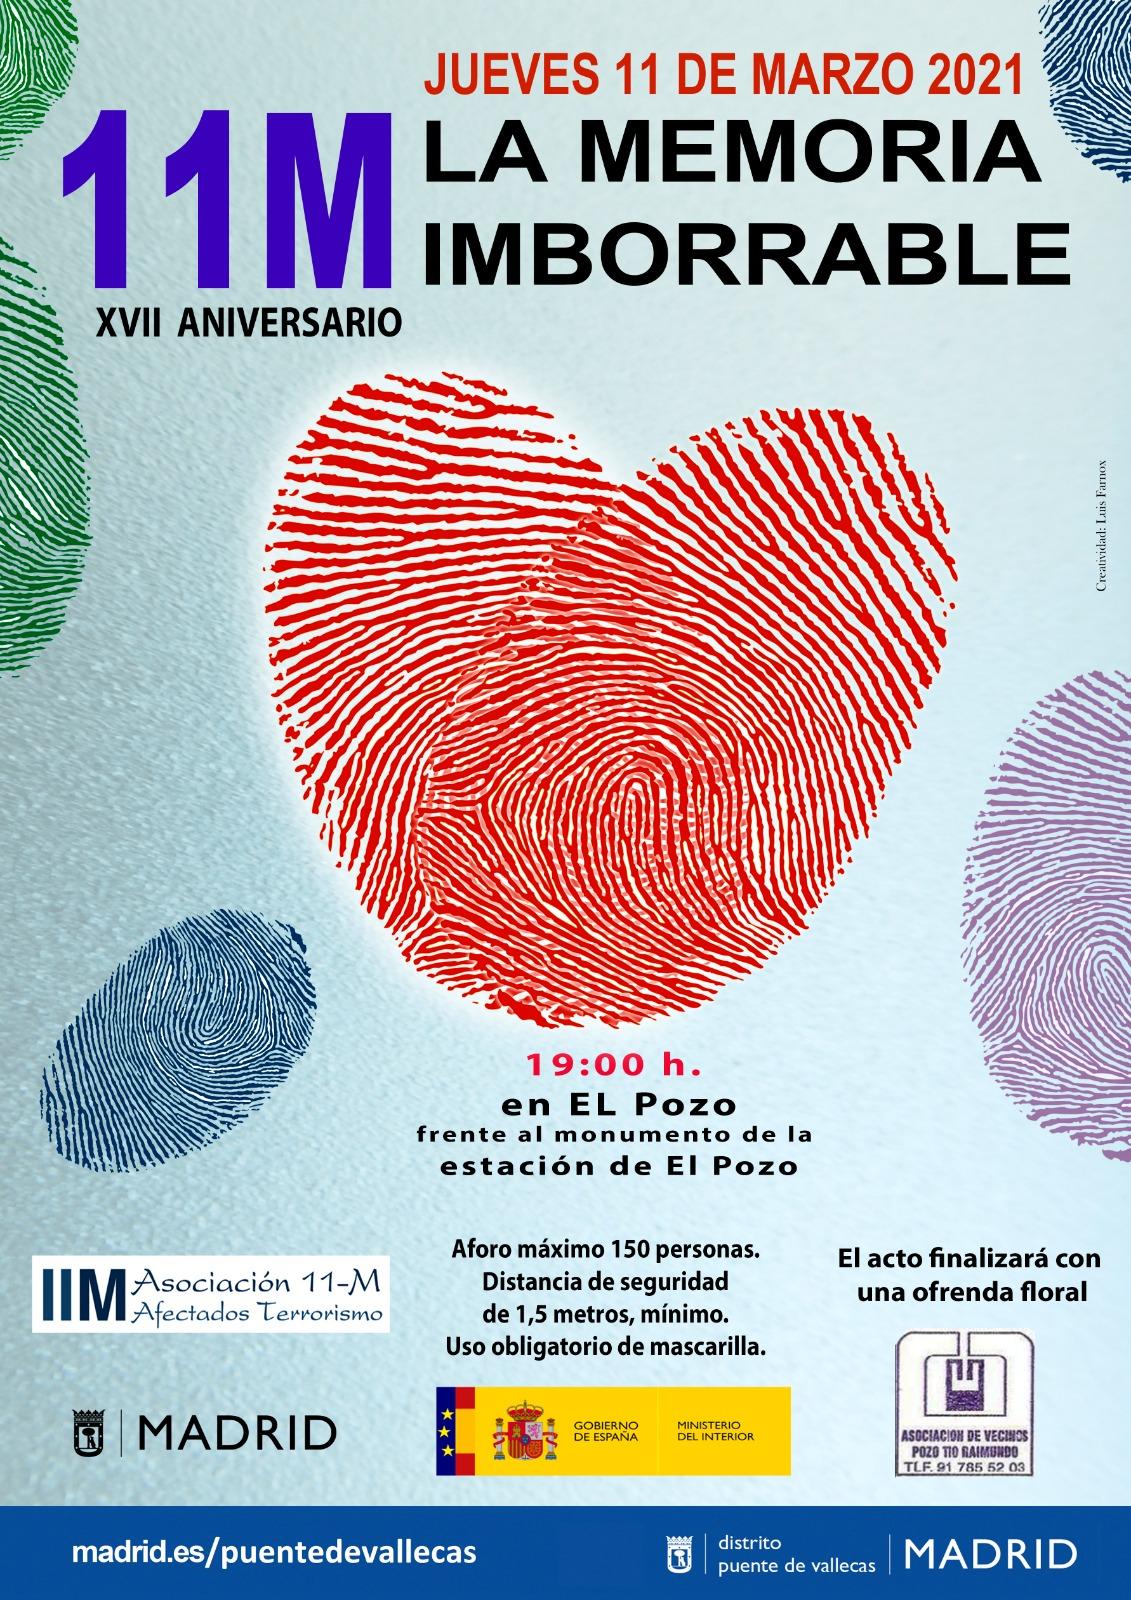 11M La Memoria Imborrable, El Pozo